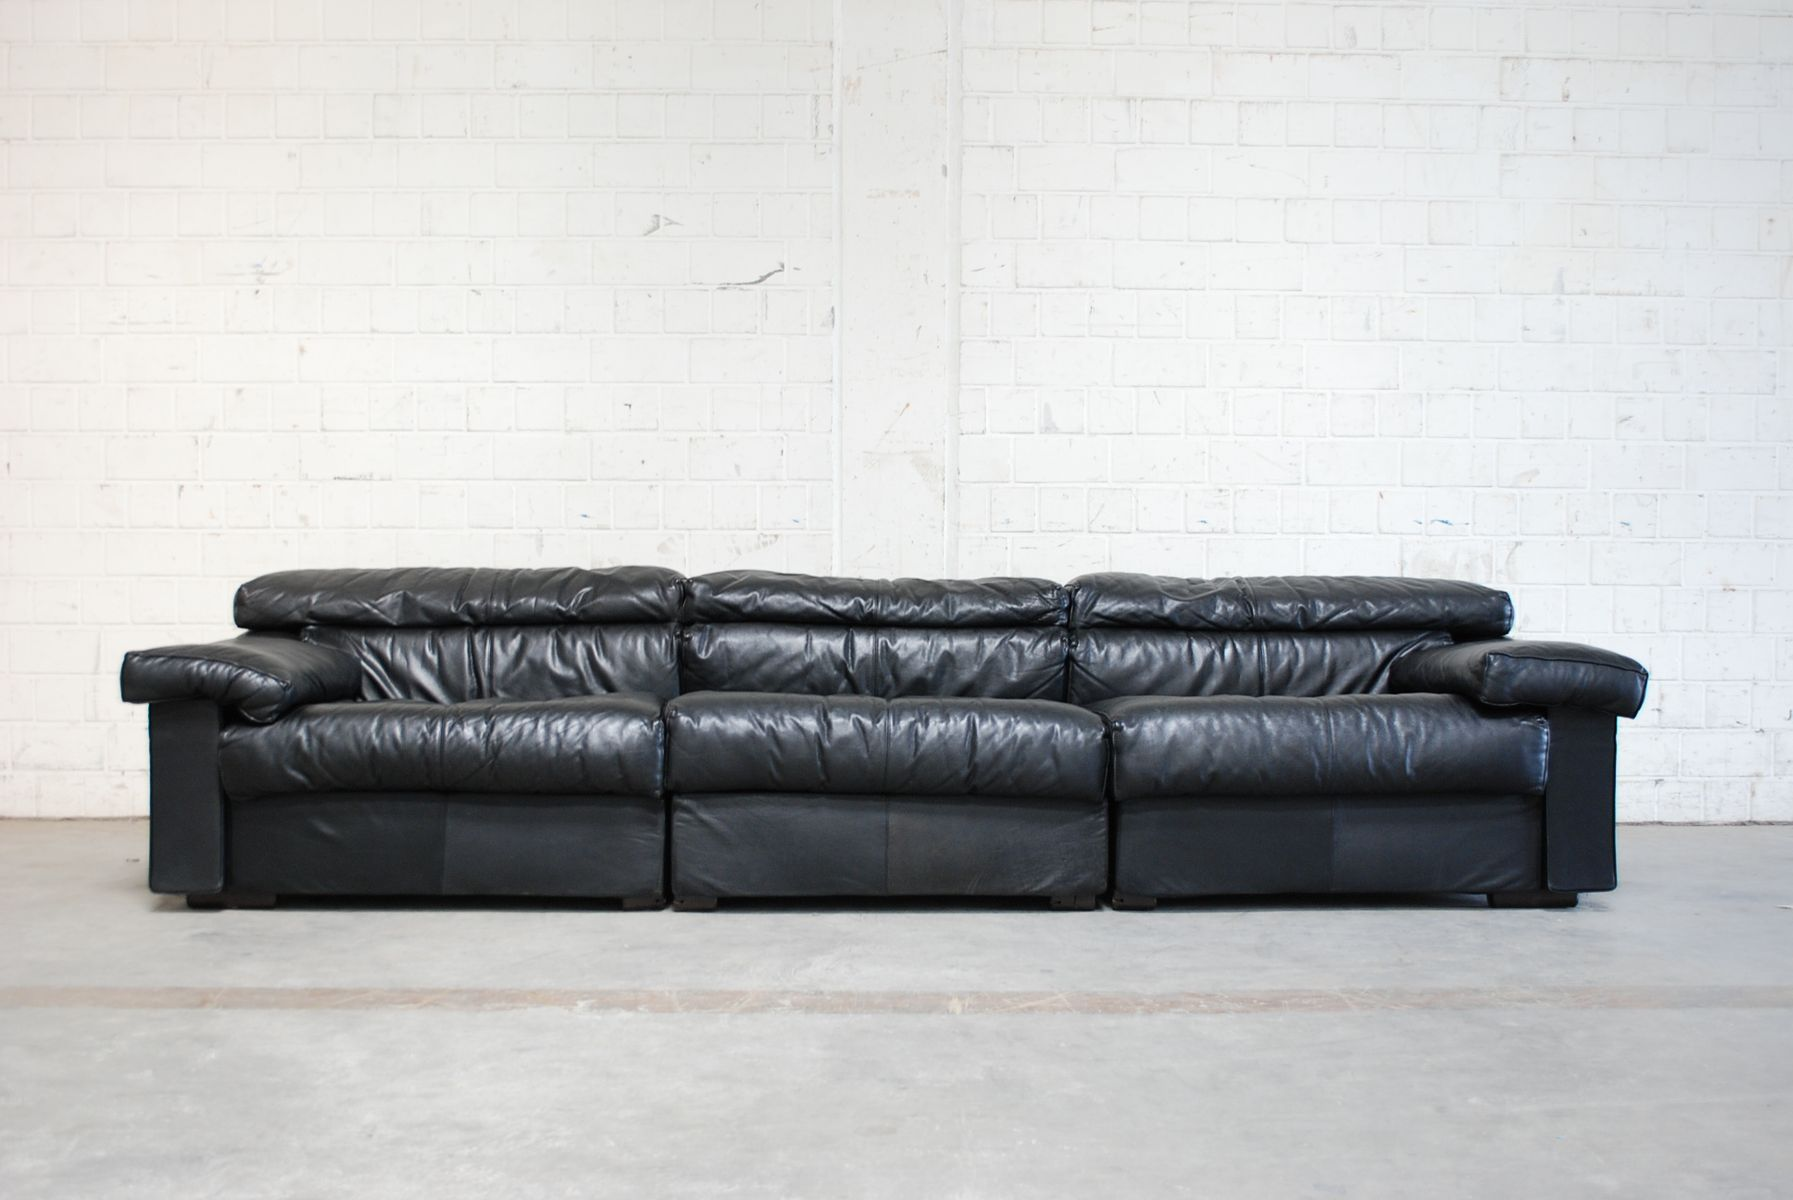 Modular Erasmo Leather Sofa By Afra Tobia Scarpa For B B Italia 1970s For Sale At Pamono